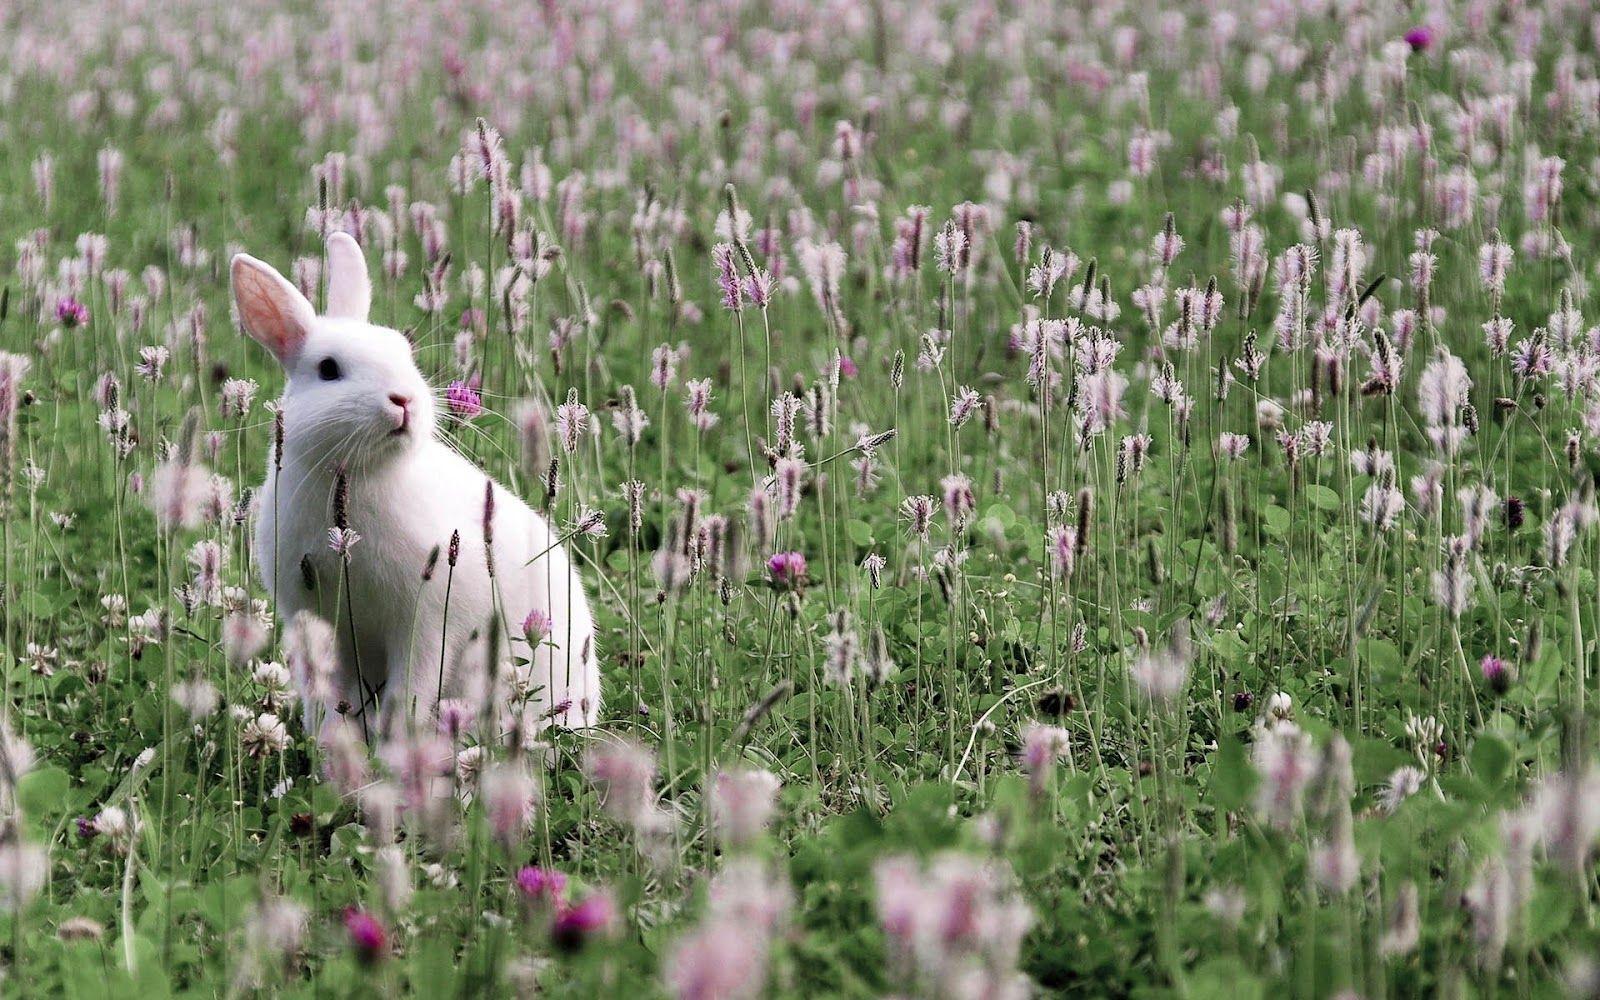 White Rabbit Wallpapers